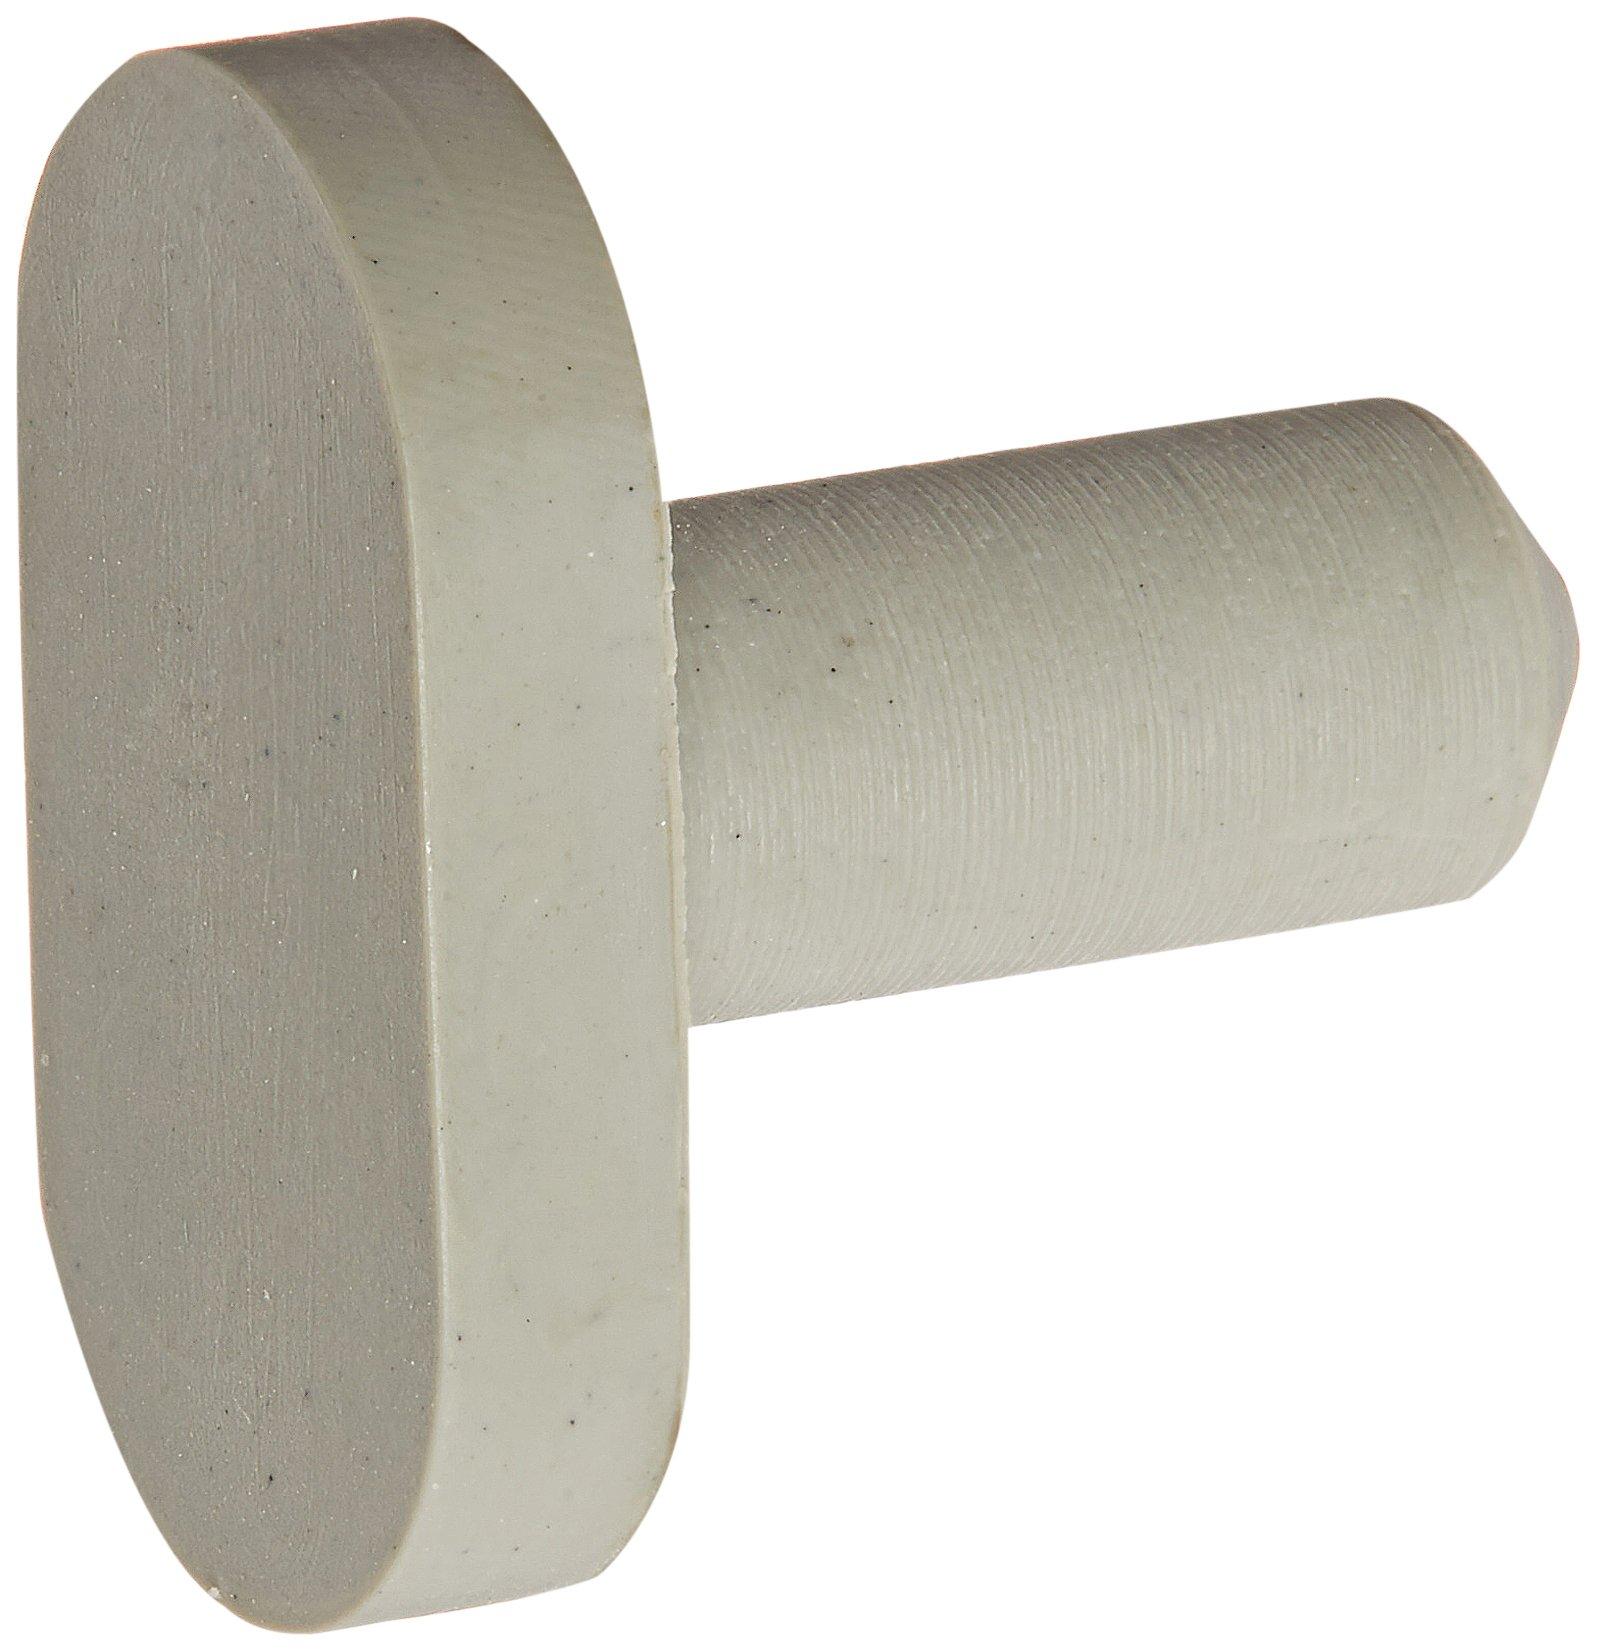 Ives Commercial SR65BG Door Silencer for Wood Frame, Rubber, 100 per Bag